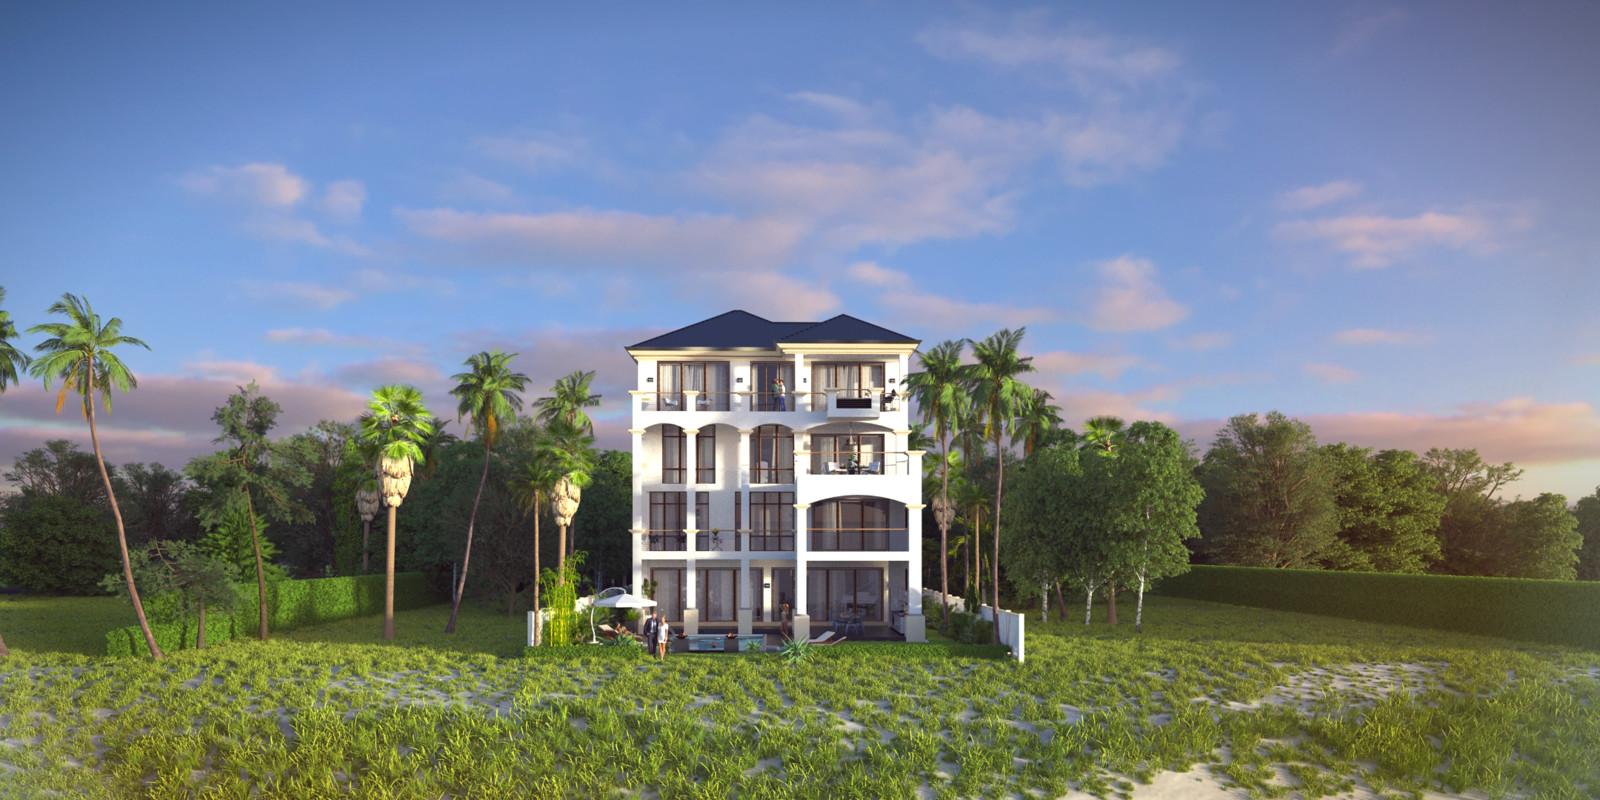 SketchUp + Thea Render  Seagrove Beach House: Scene 35 2pt A Lumina Sun 2160 × 1080 Presto MC Bucket